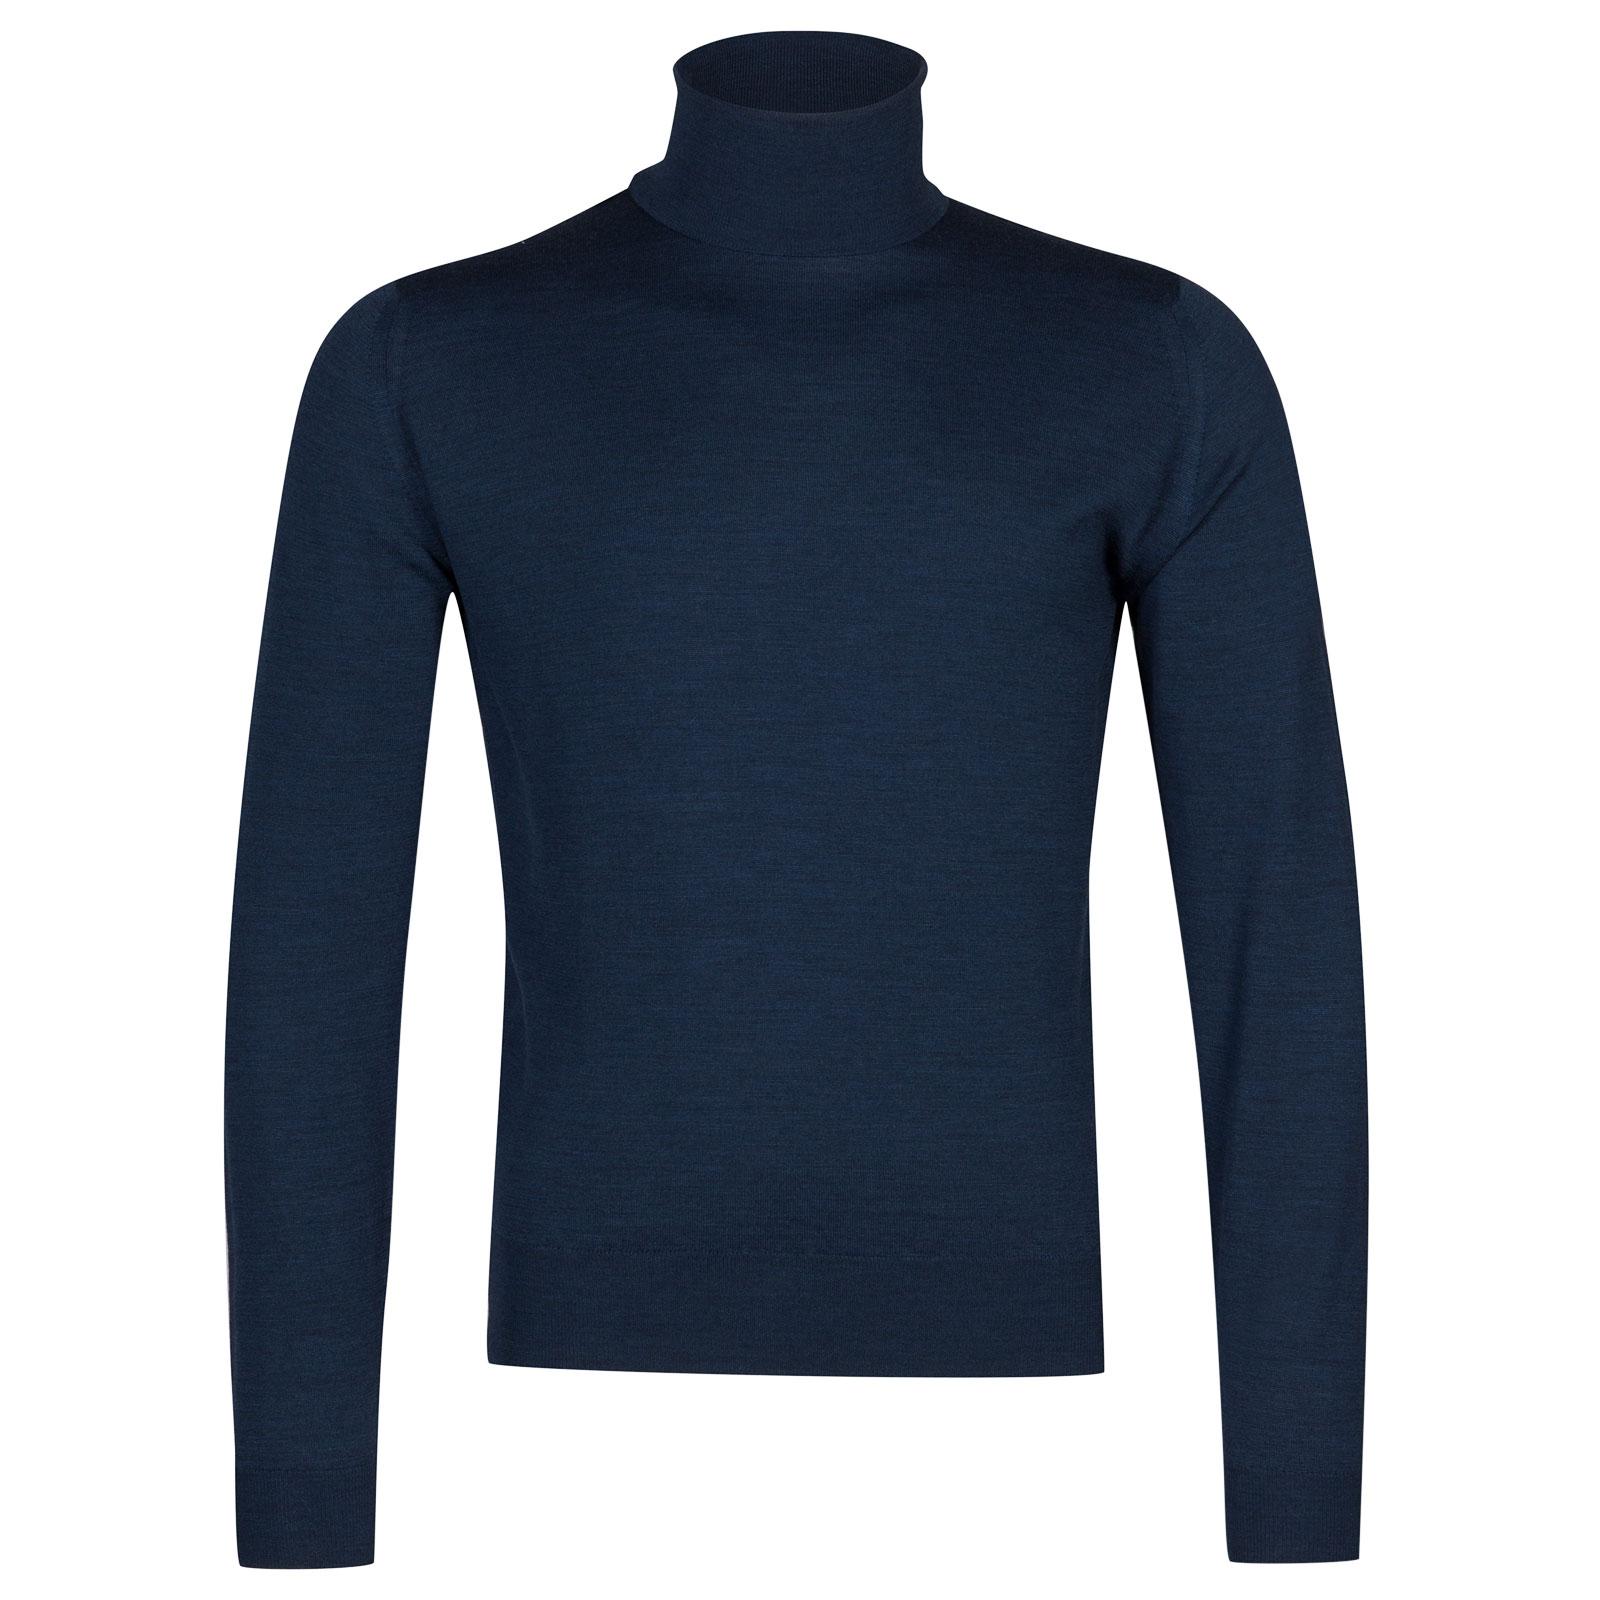 John Smedley Orta Merino Wool Pullover in Indigo-XXL